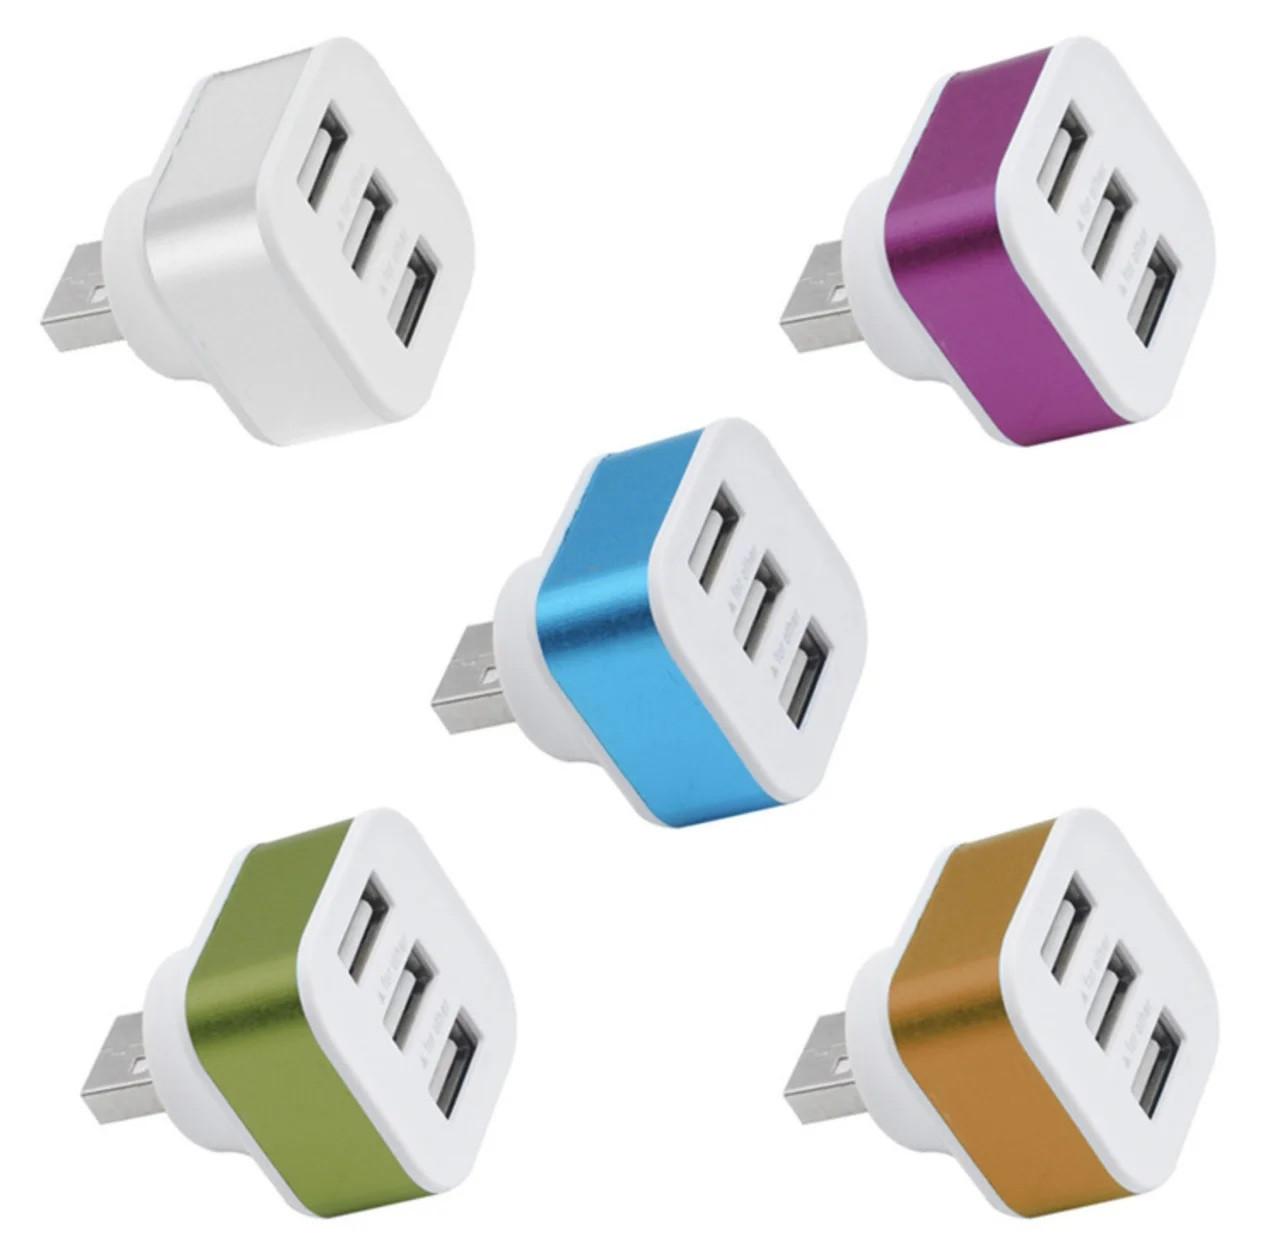 USB Hub (ЮСБ хаб) - 3 порти